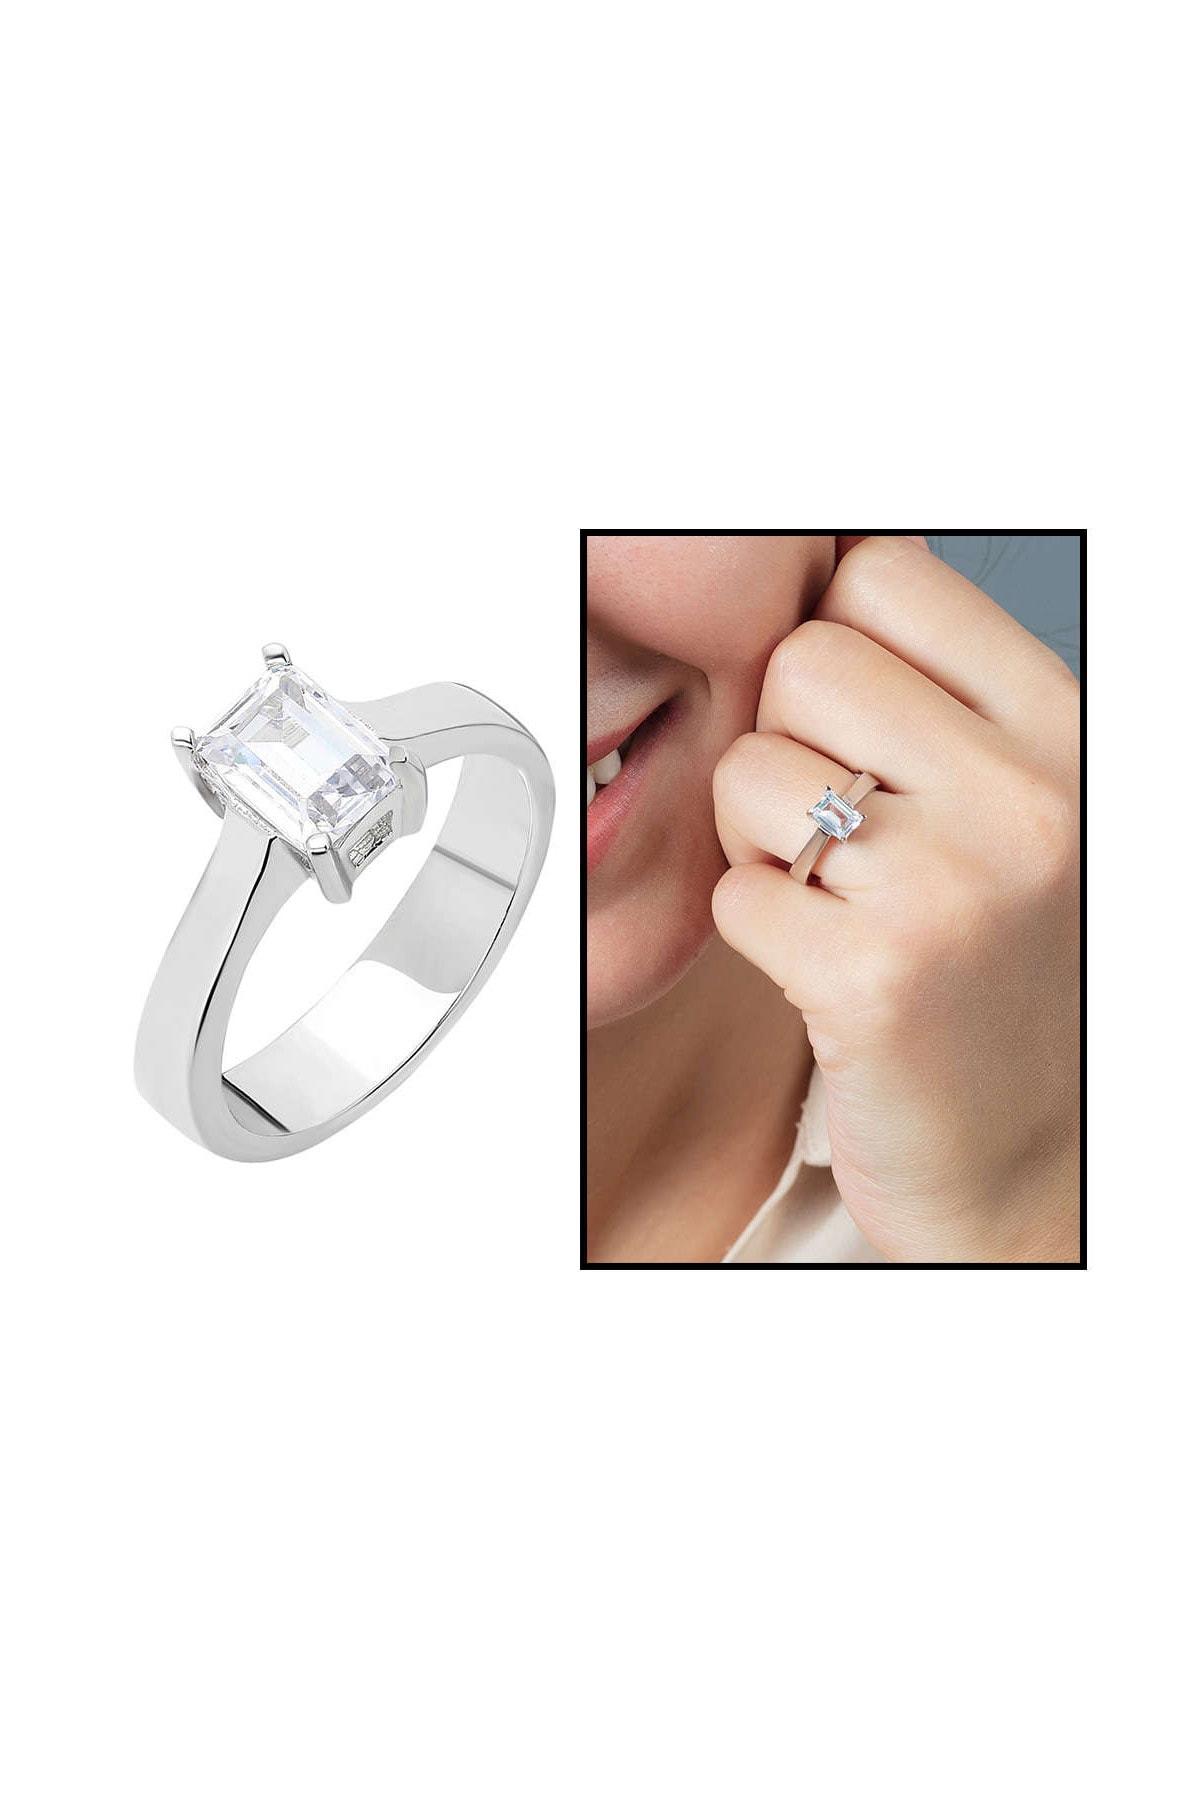 Tesbihane Starlight Diamond Pırlanta Montür Minimal Tasarım 925 Ayar Gümüş Bayan Baget Yüzük 102001792 1